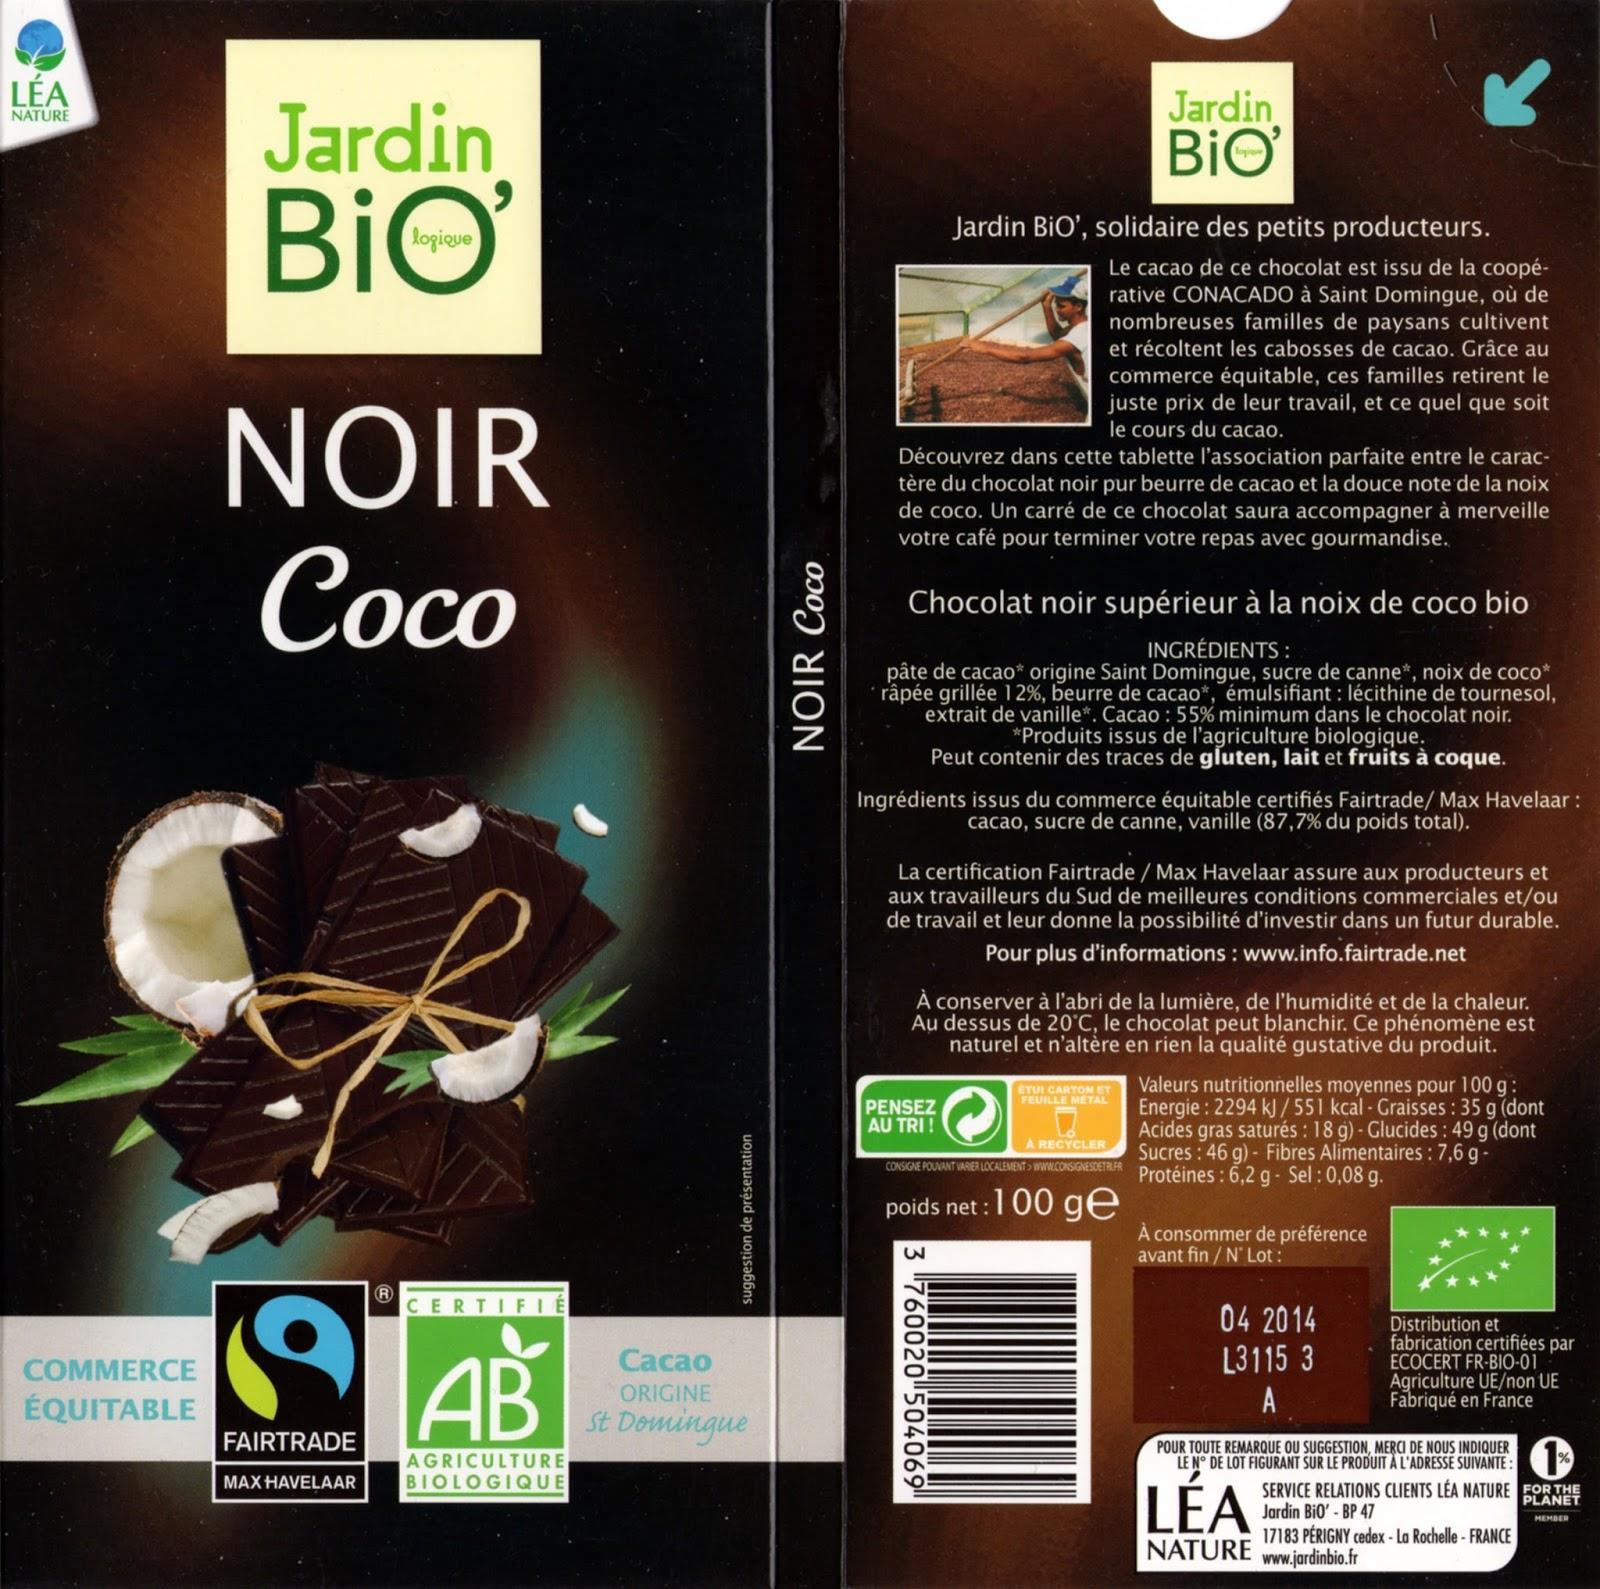 Jardin Bio Noir Coco Tablette de Choc